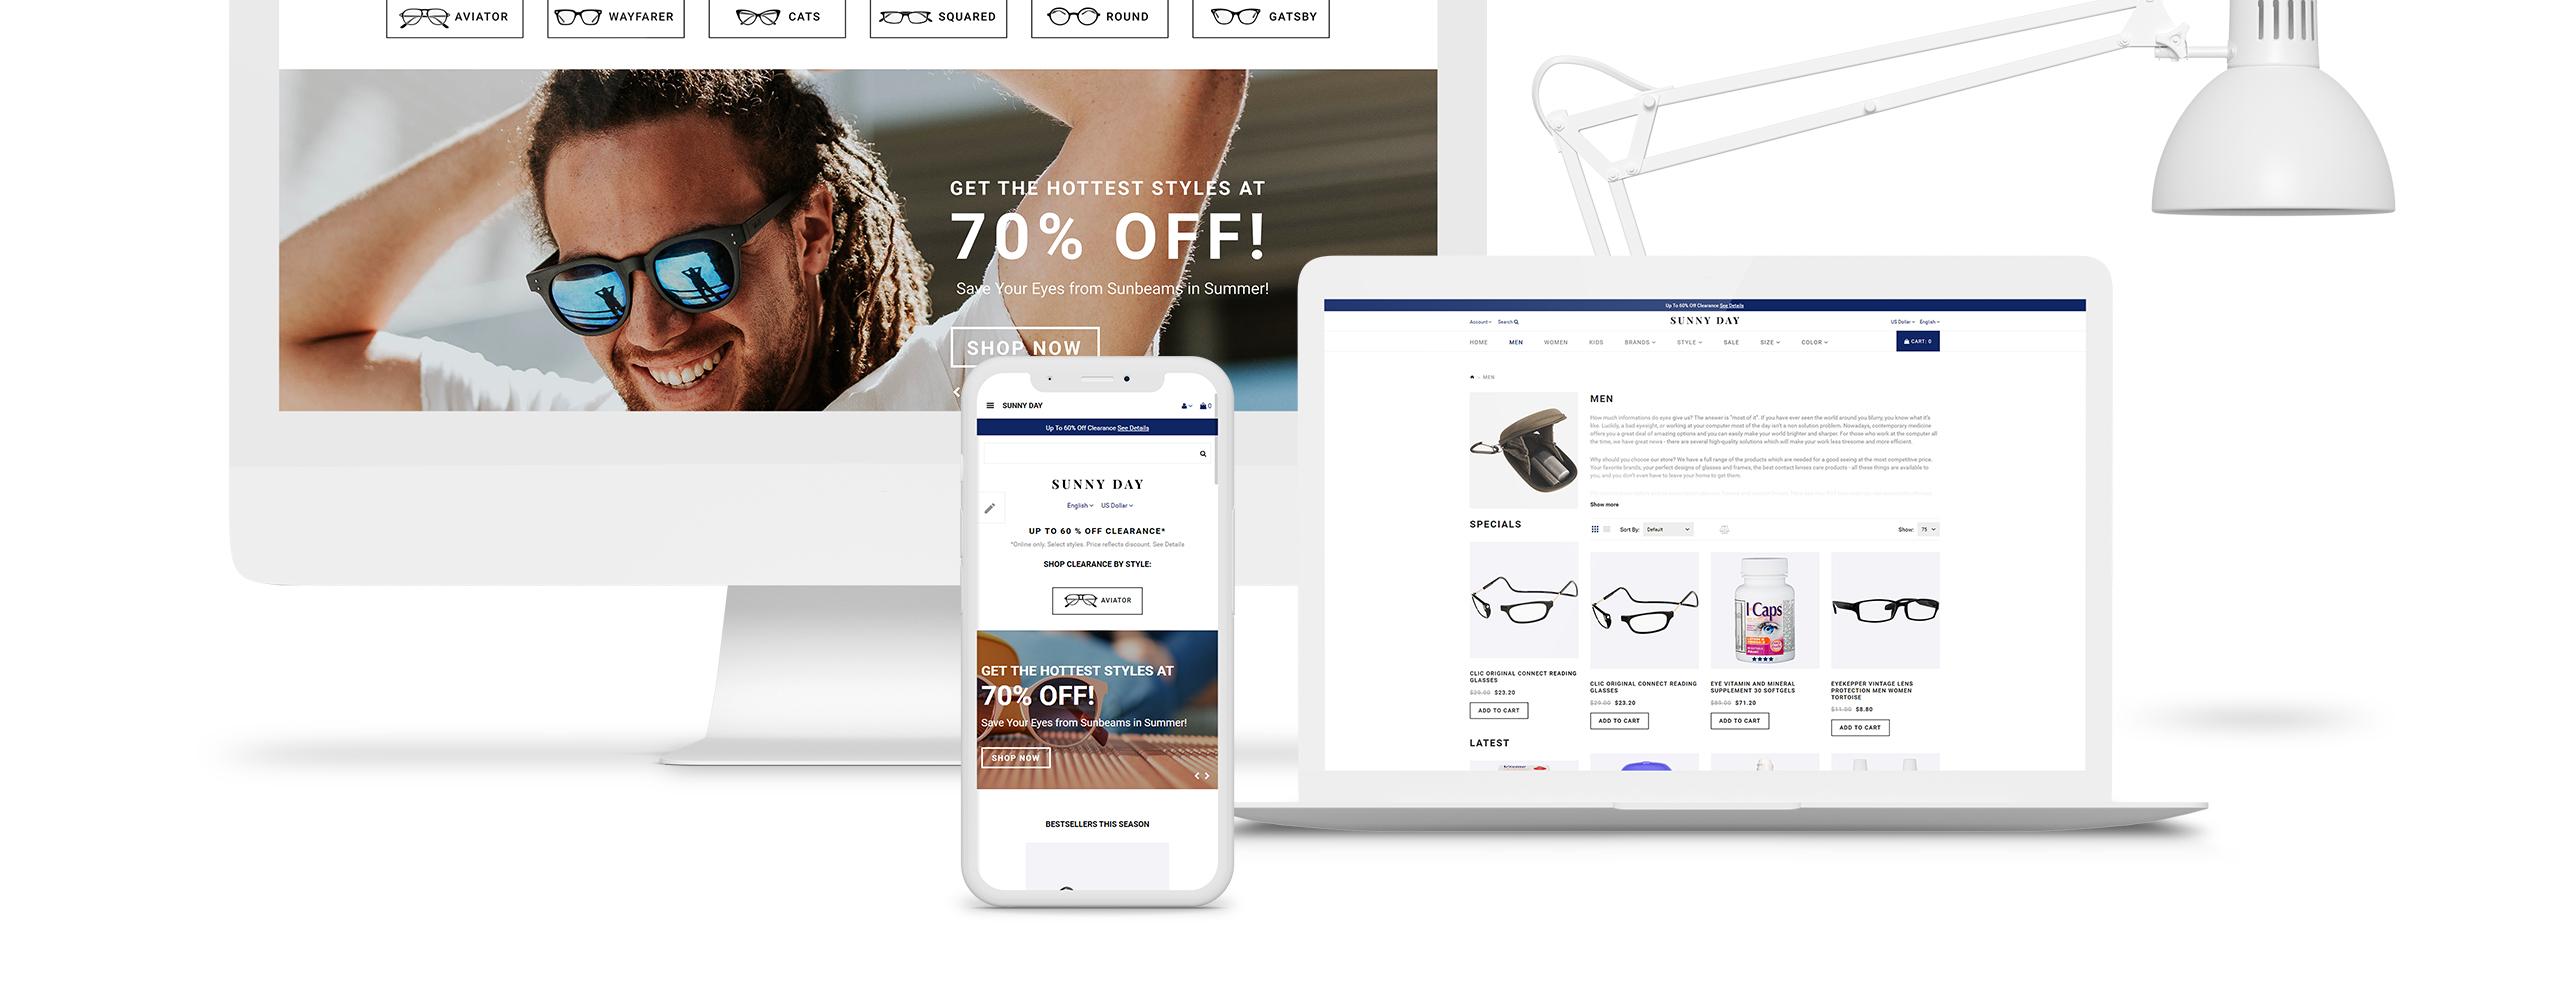 Website Design Template 70709 - cosmetics beauty drug store sunglasses eyeglasses optic optical jewelry electronics gifts online shopping clothing fashion